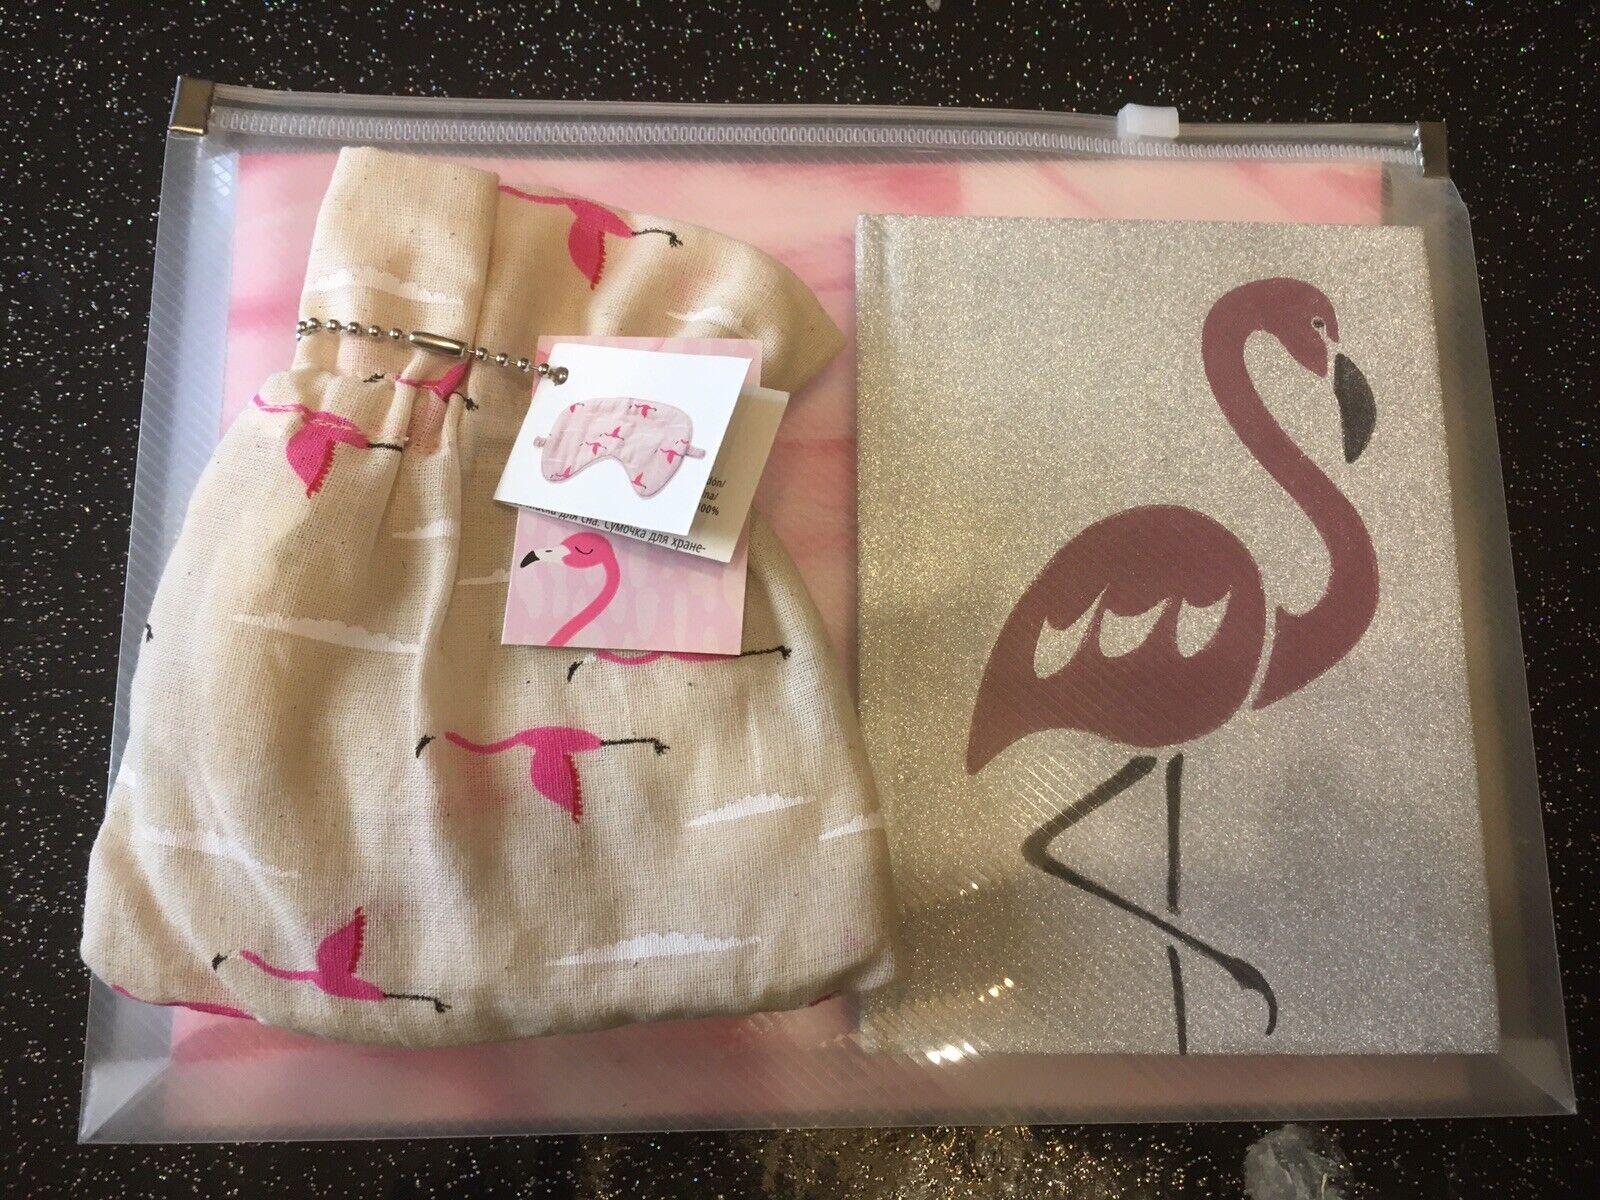 Fab Flamingo Eye Mask +A6 Hardback Glitter Notebook In Sheer Pouch 3pc Gift Set